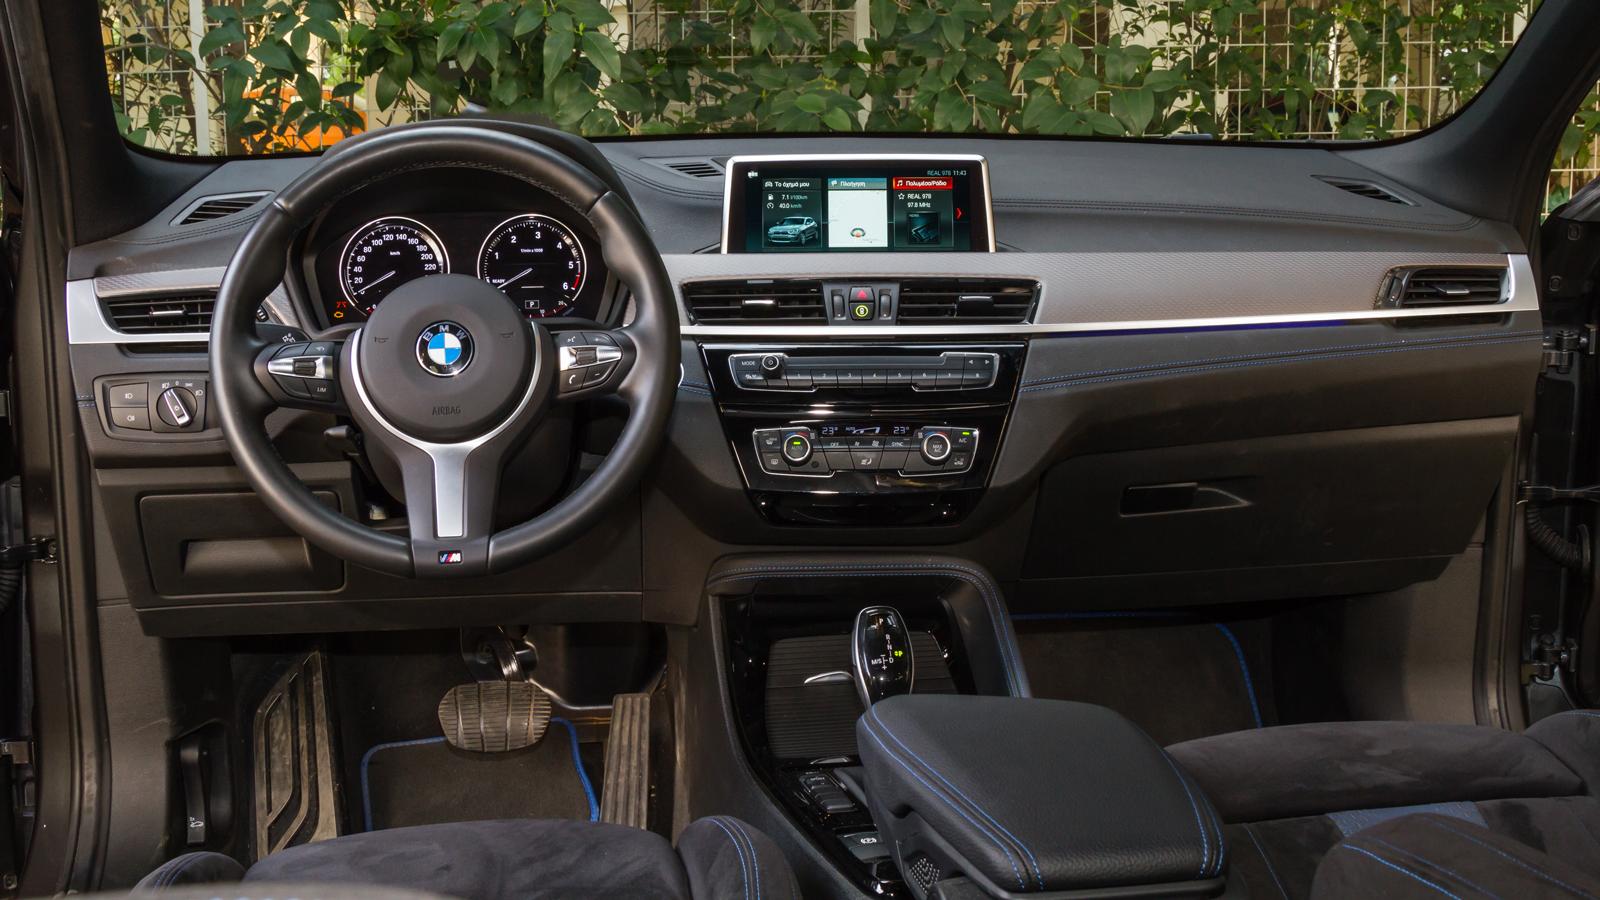 H πιο σημαντική αύξηση να λαμβάνει χώρα στις πίσω θέσεις εκεί όπου τα πόδια  των επιβατών θα έχουν 150 χλστ. περισσότερο χώρο. 8c4dbc38092